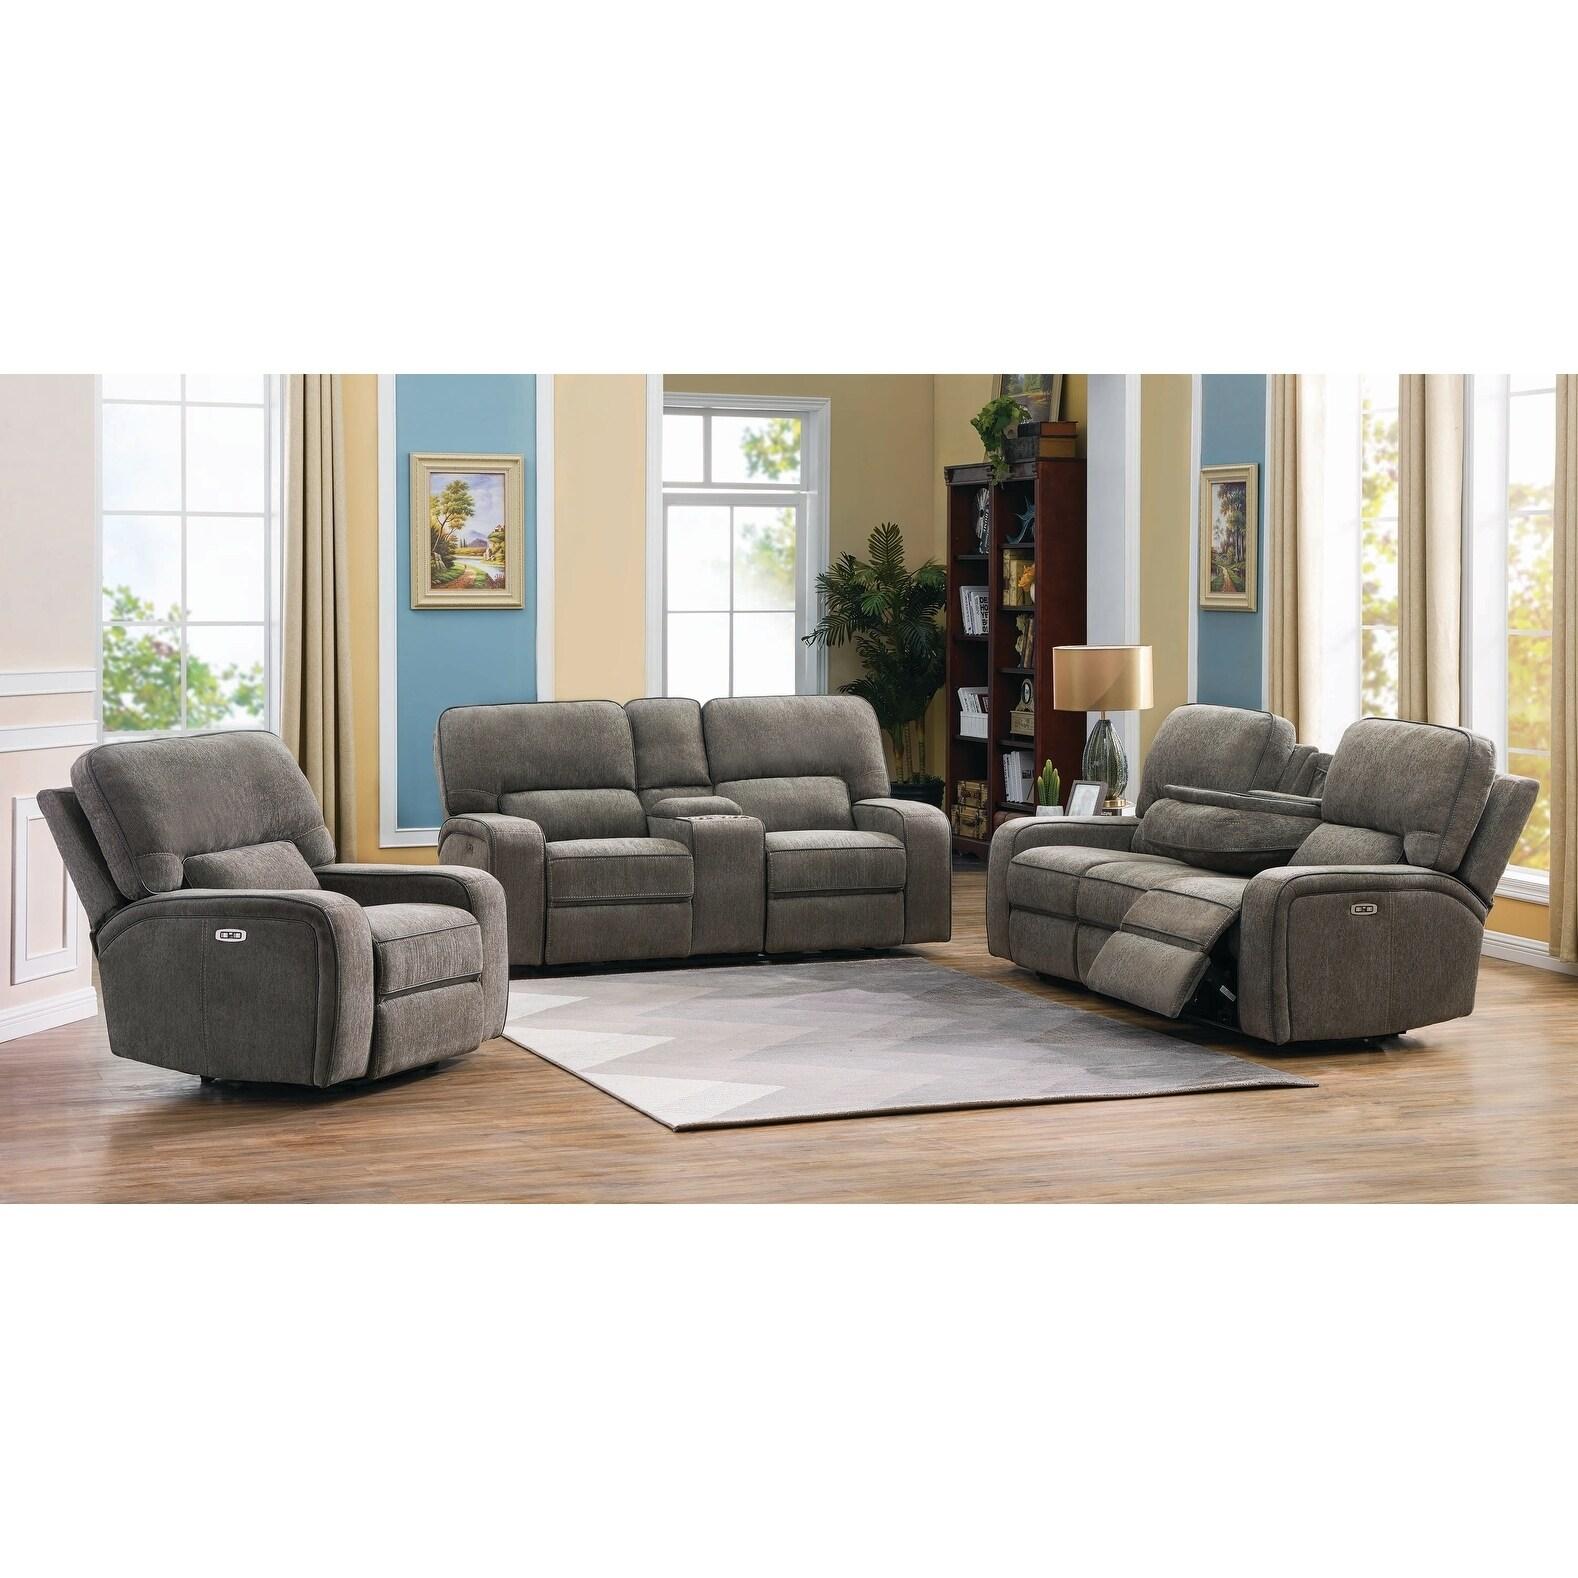 Groveland 3 Piece Power Living Room Set Overstock 28109044